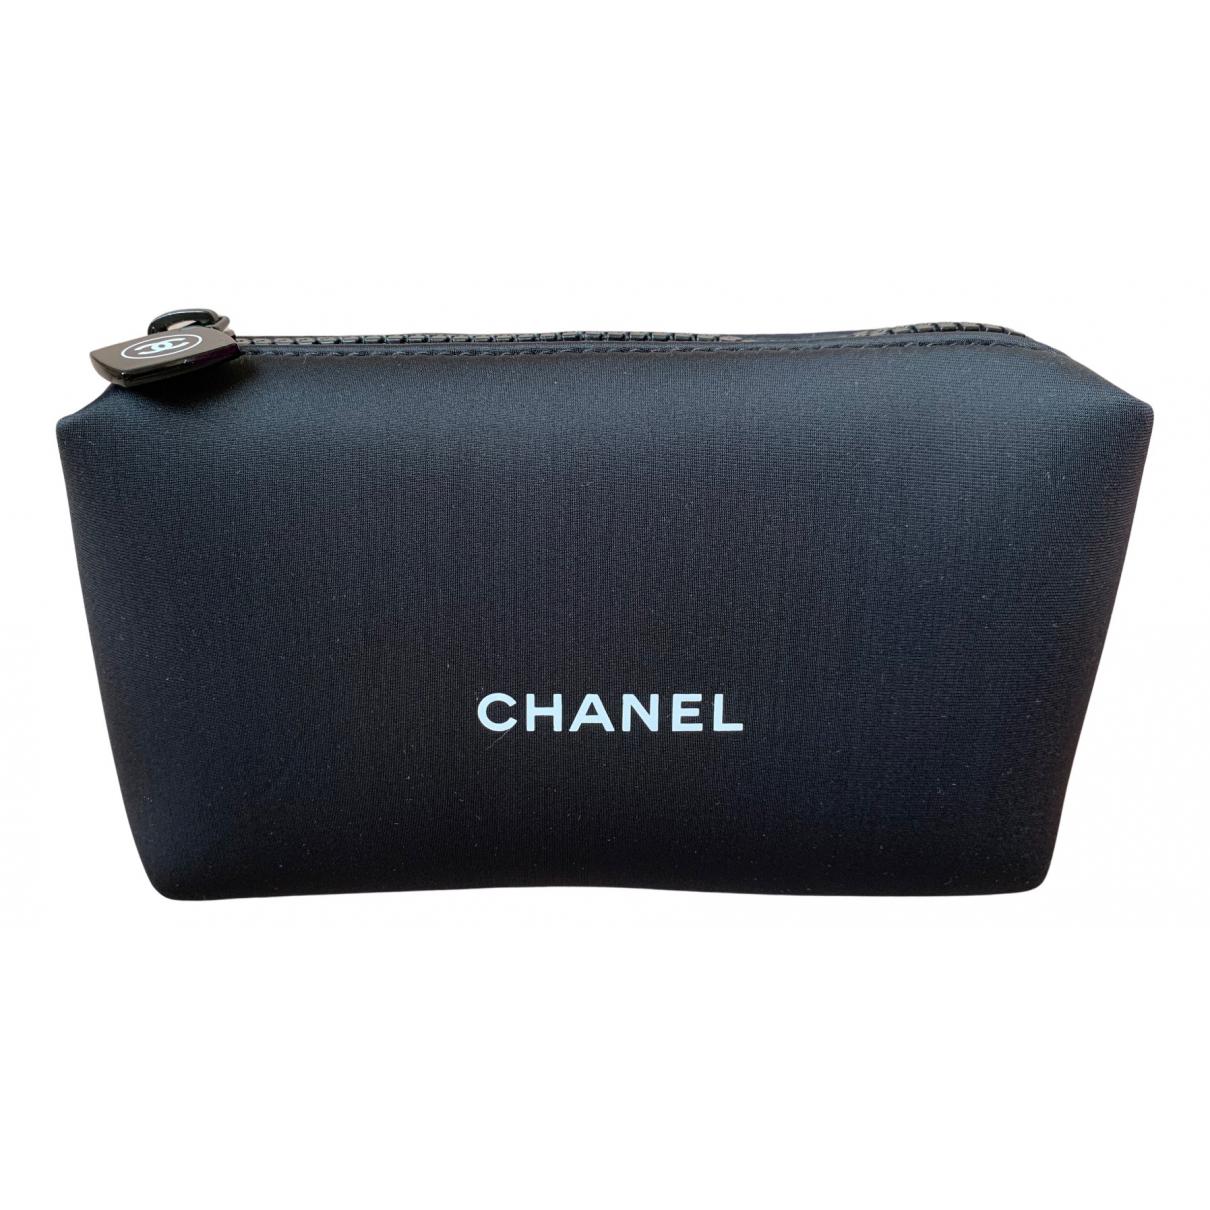 Chanel \N Clutch in  Schwarz Synthetik